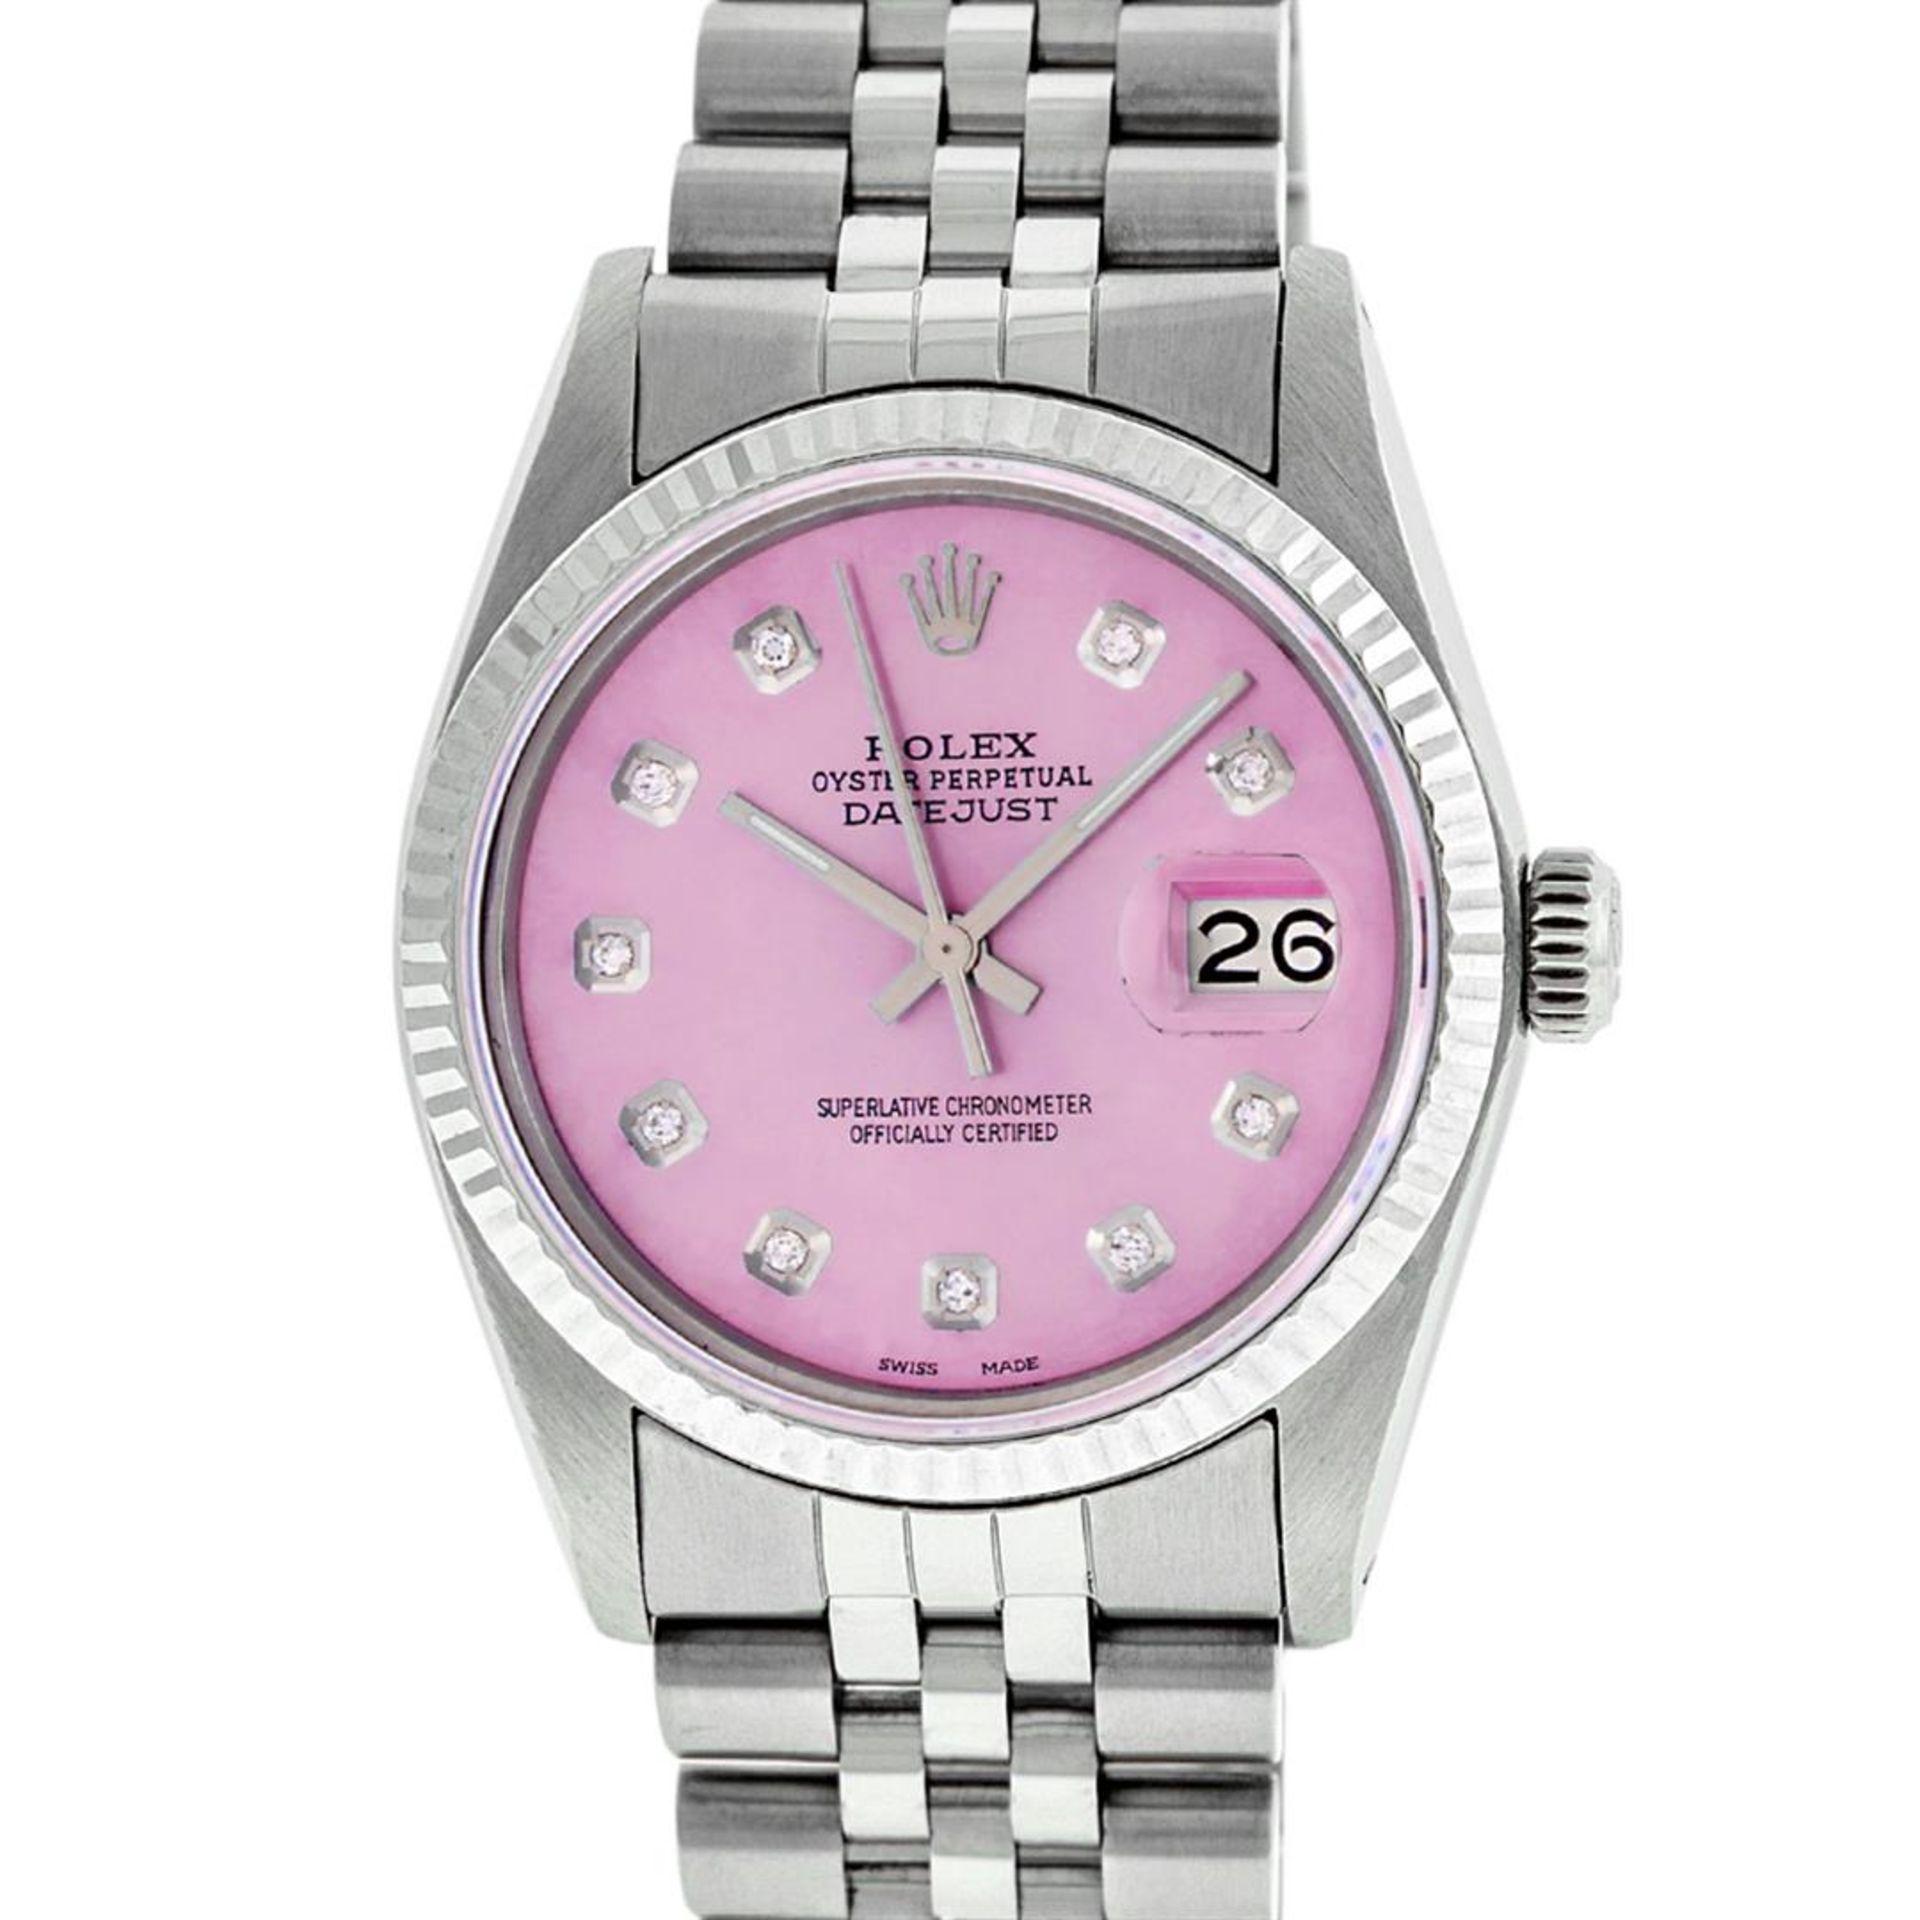 Rolex Ladies 2 Tone Pink MOP Diamond & Sapphire String Datejust Wristwatch - Image 2 of 9